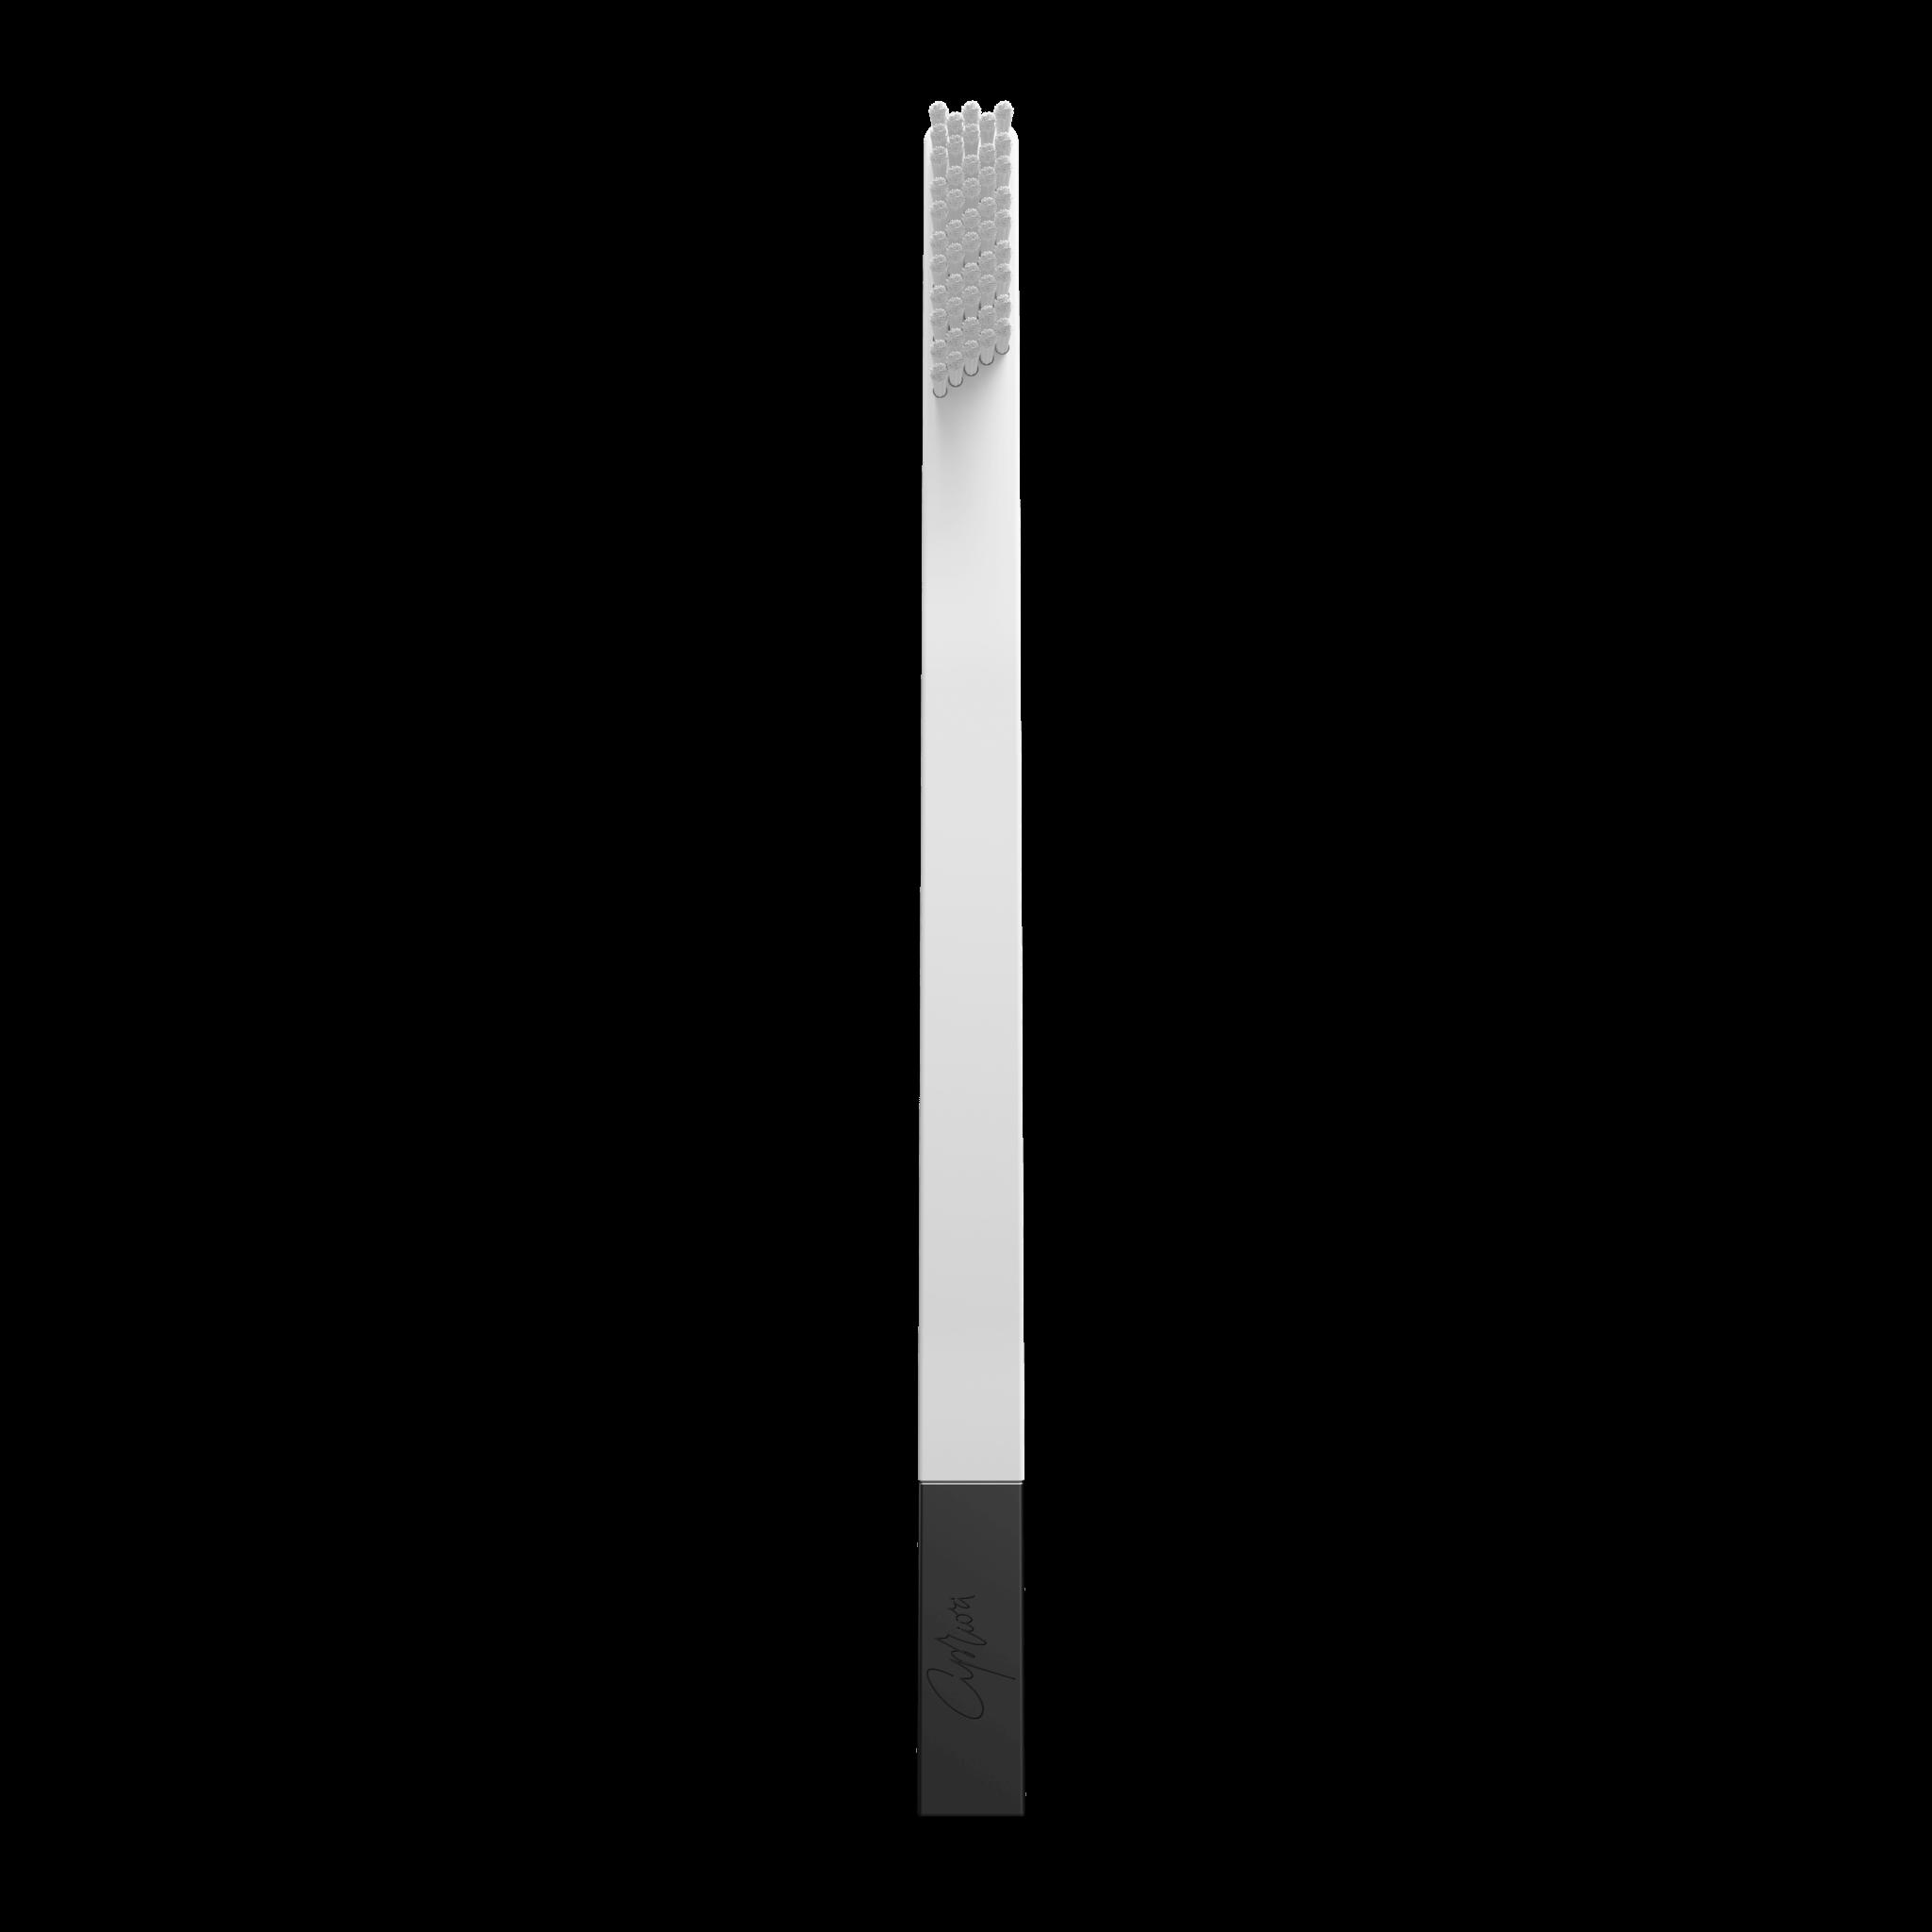 SLIM by Apriori white & black disposable toothbrush